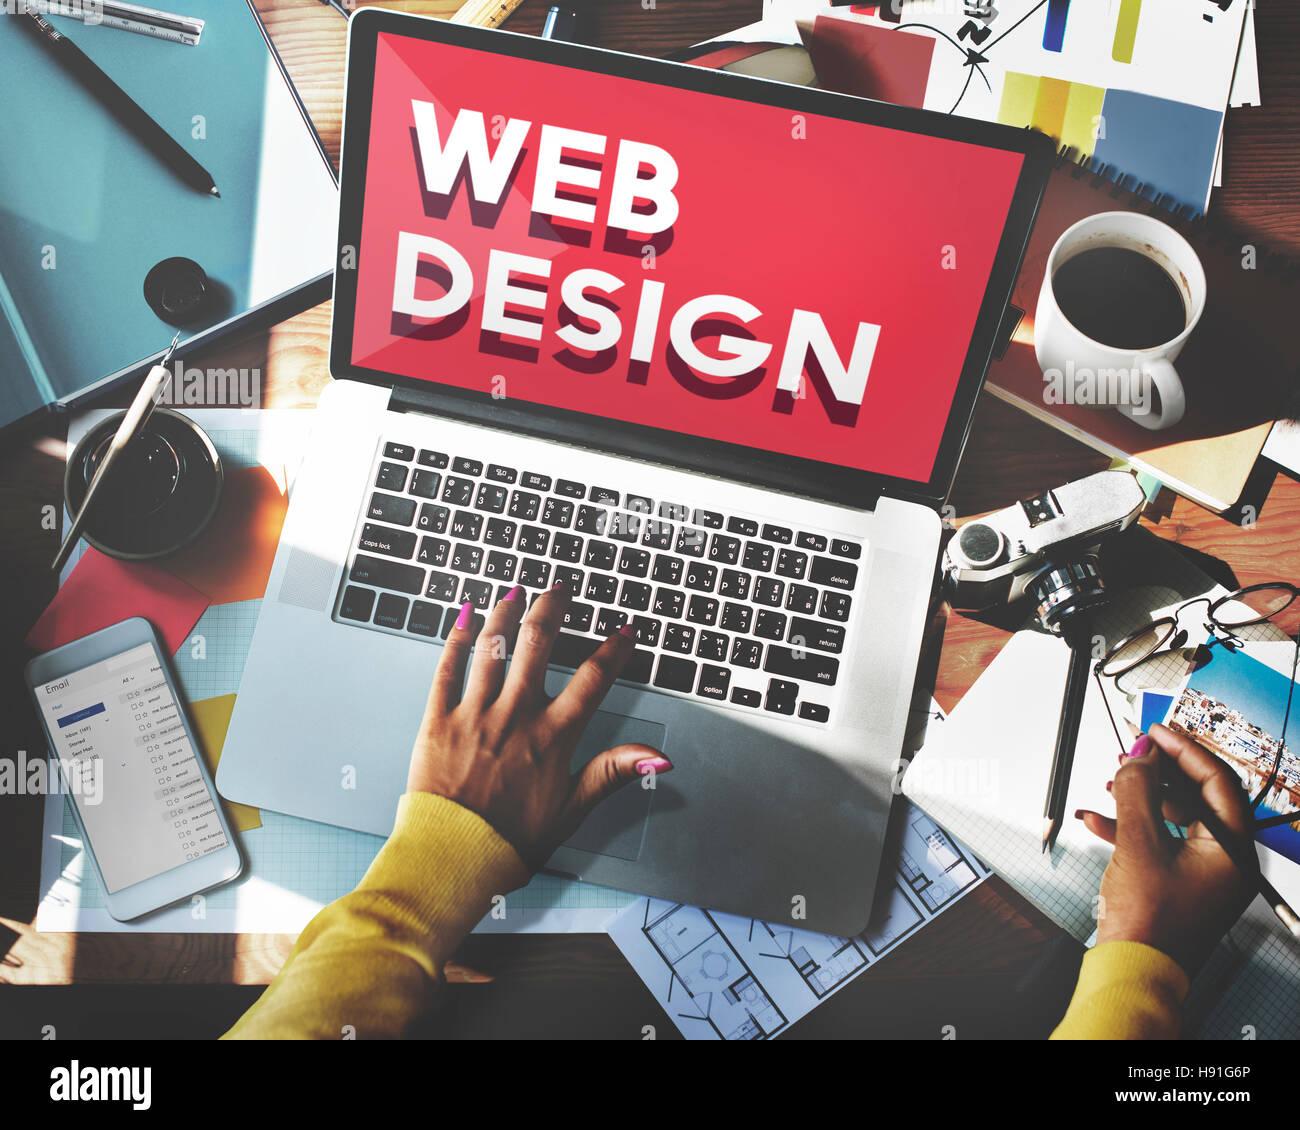 Web Design Website Homepage Ideas Programming Concept Stock Photo ...